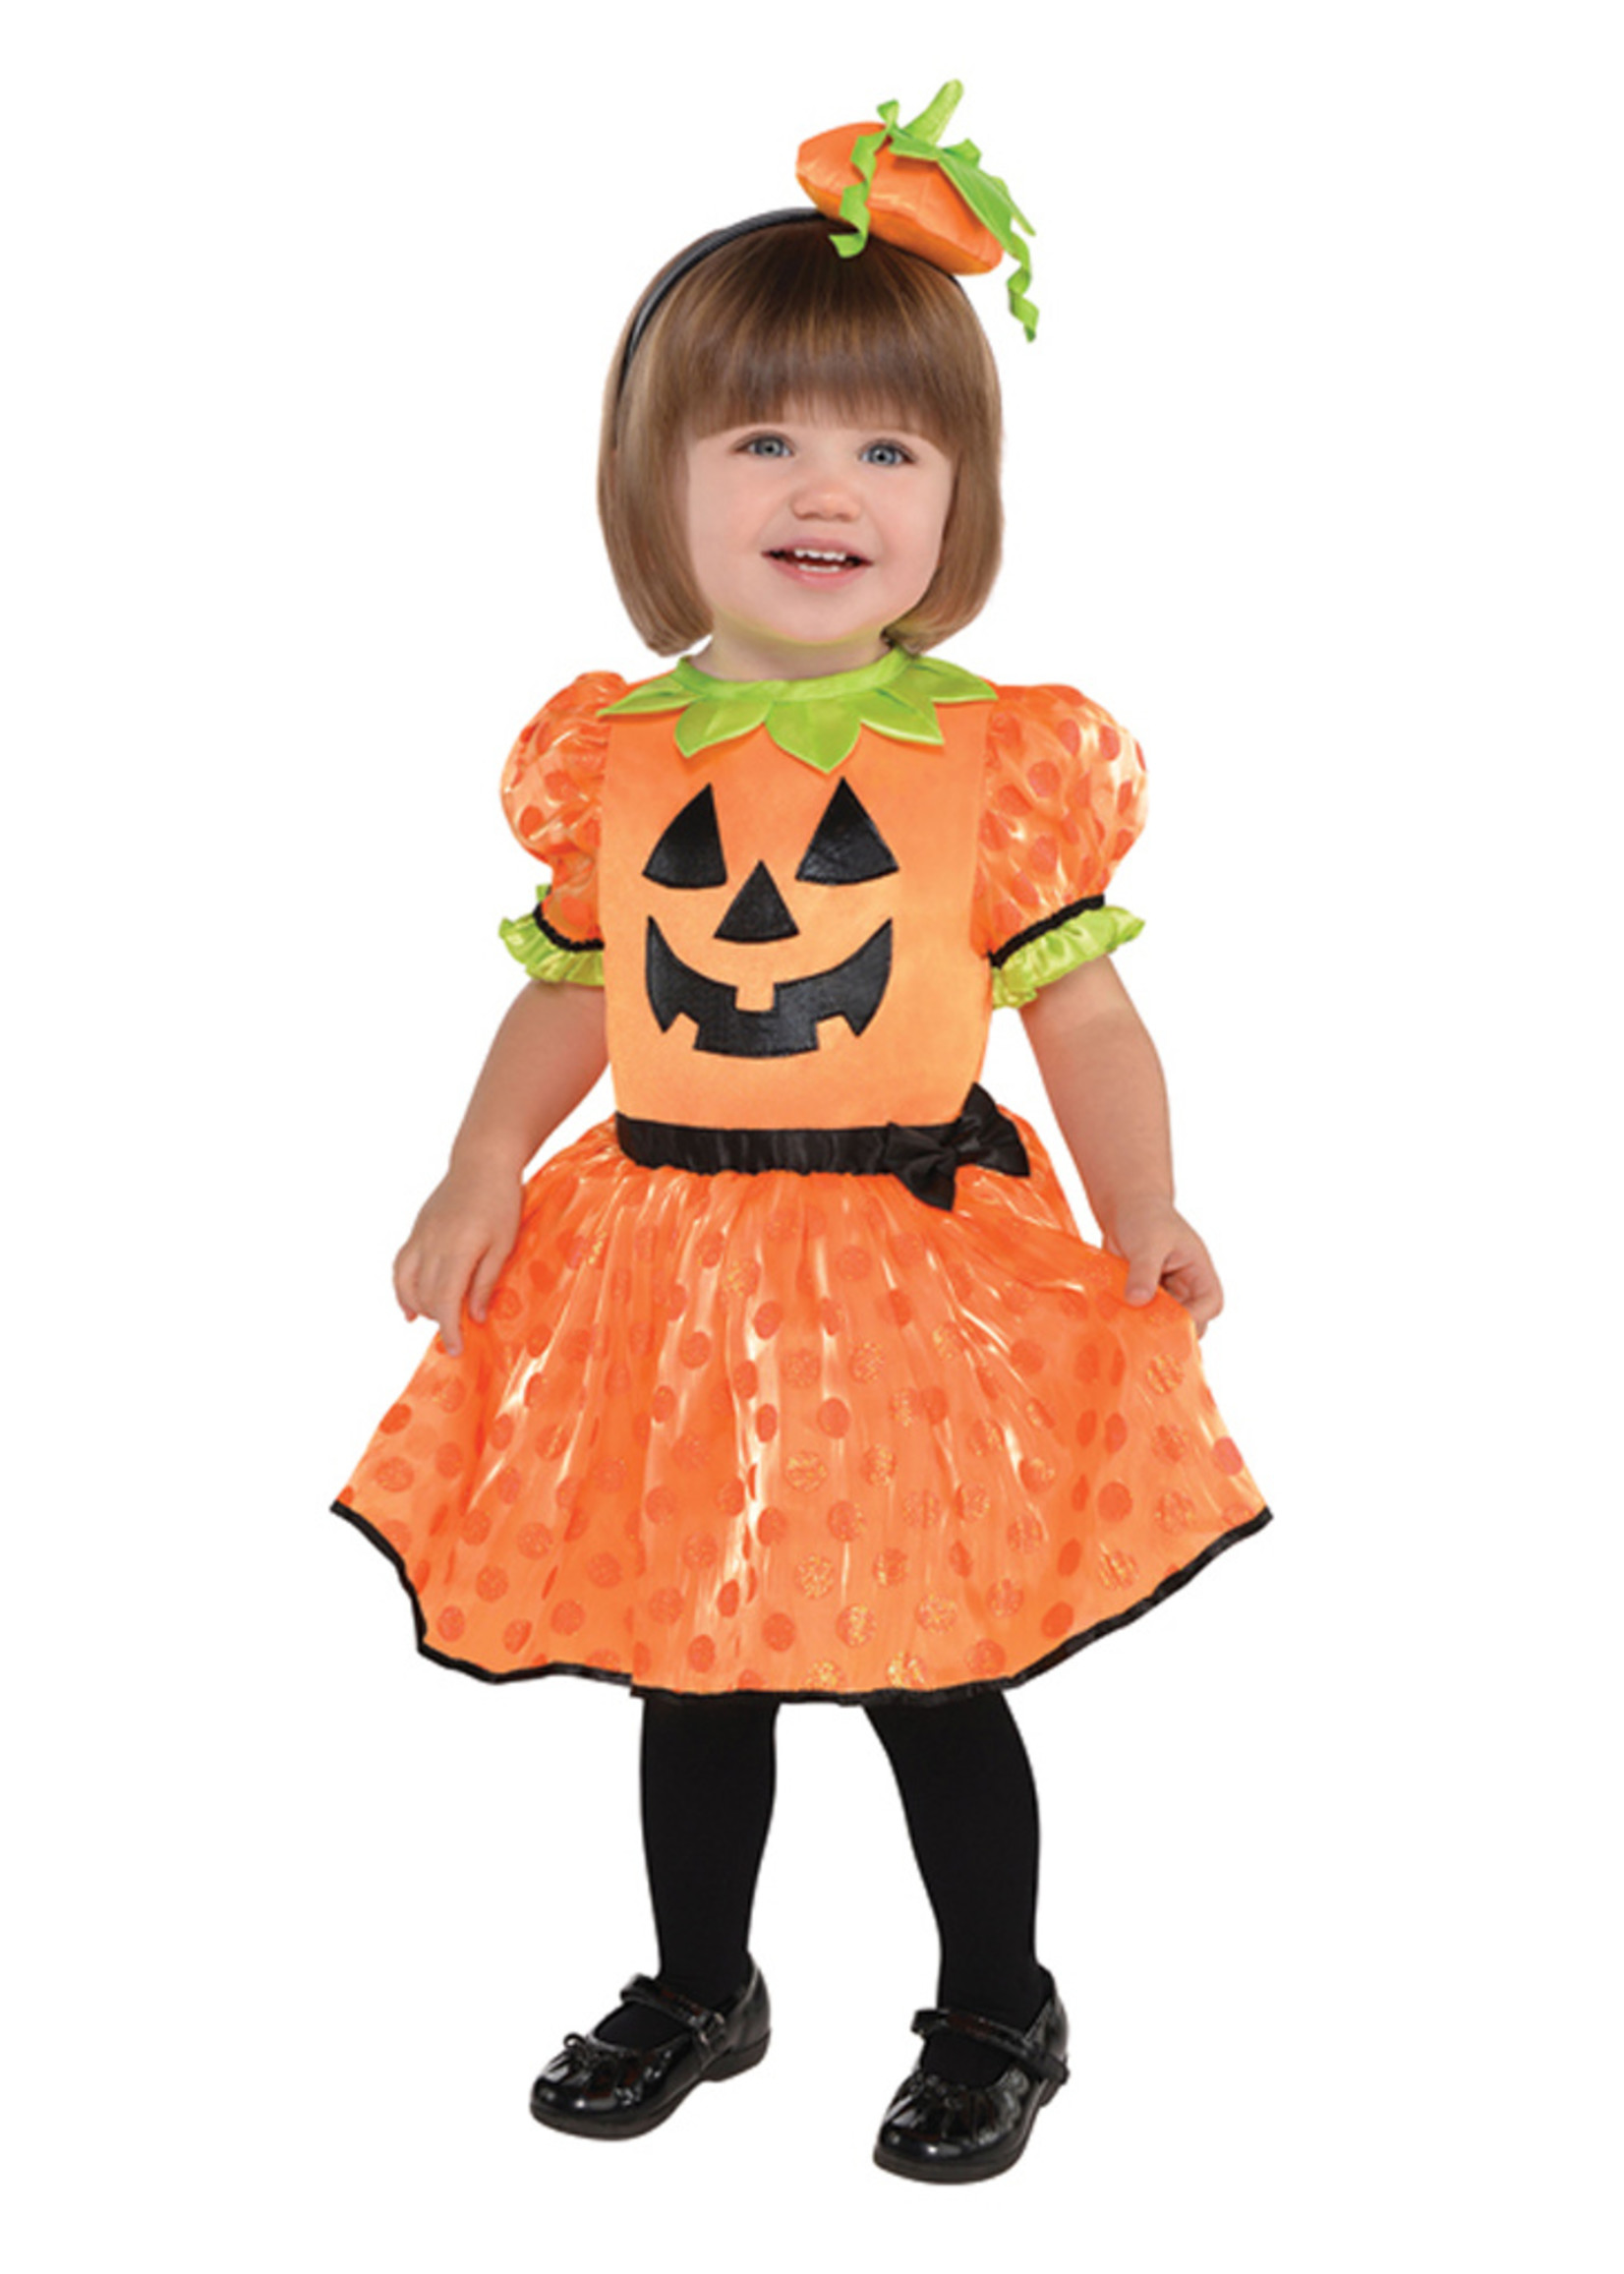 Little Pumpkin Costumes - Infant